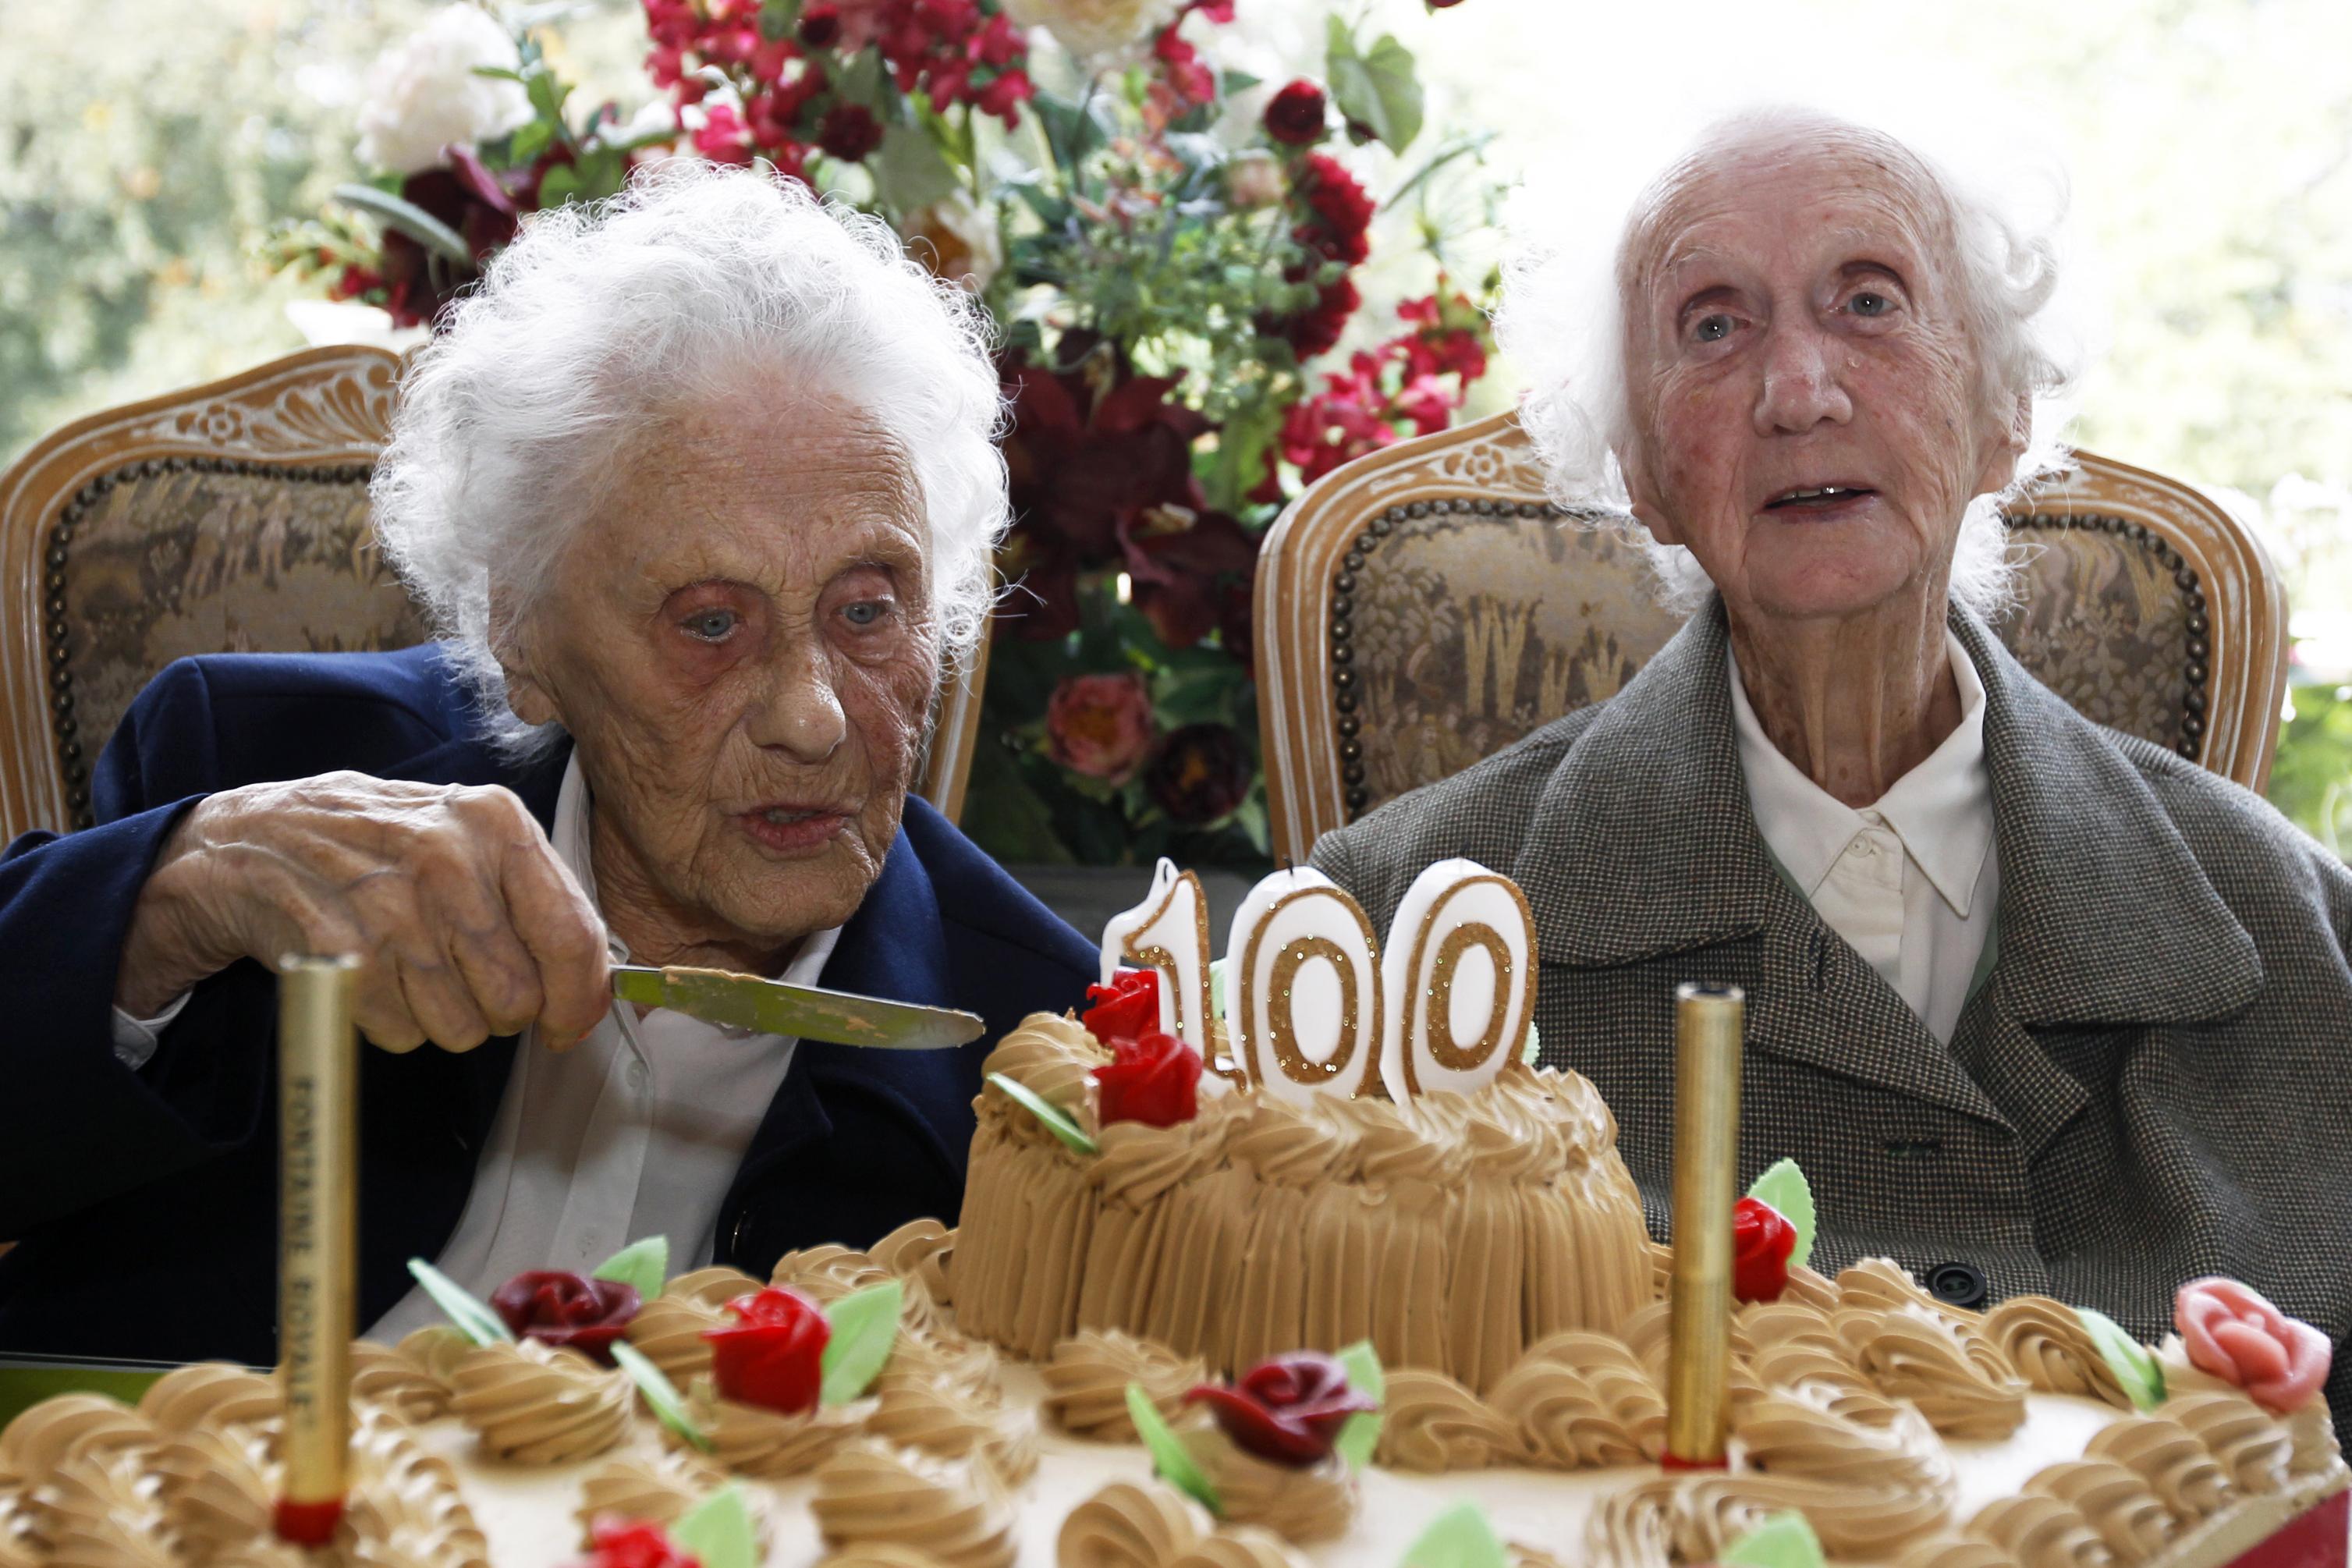 Обнаружена мутация гена, отвечающая за долголетие